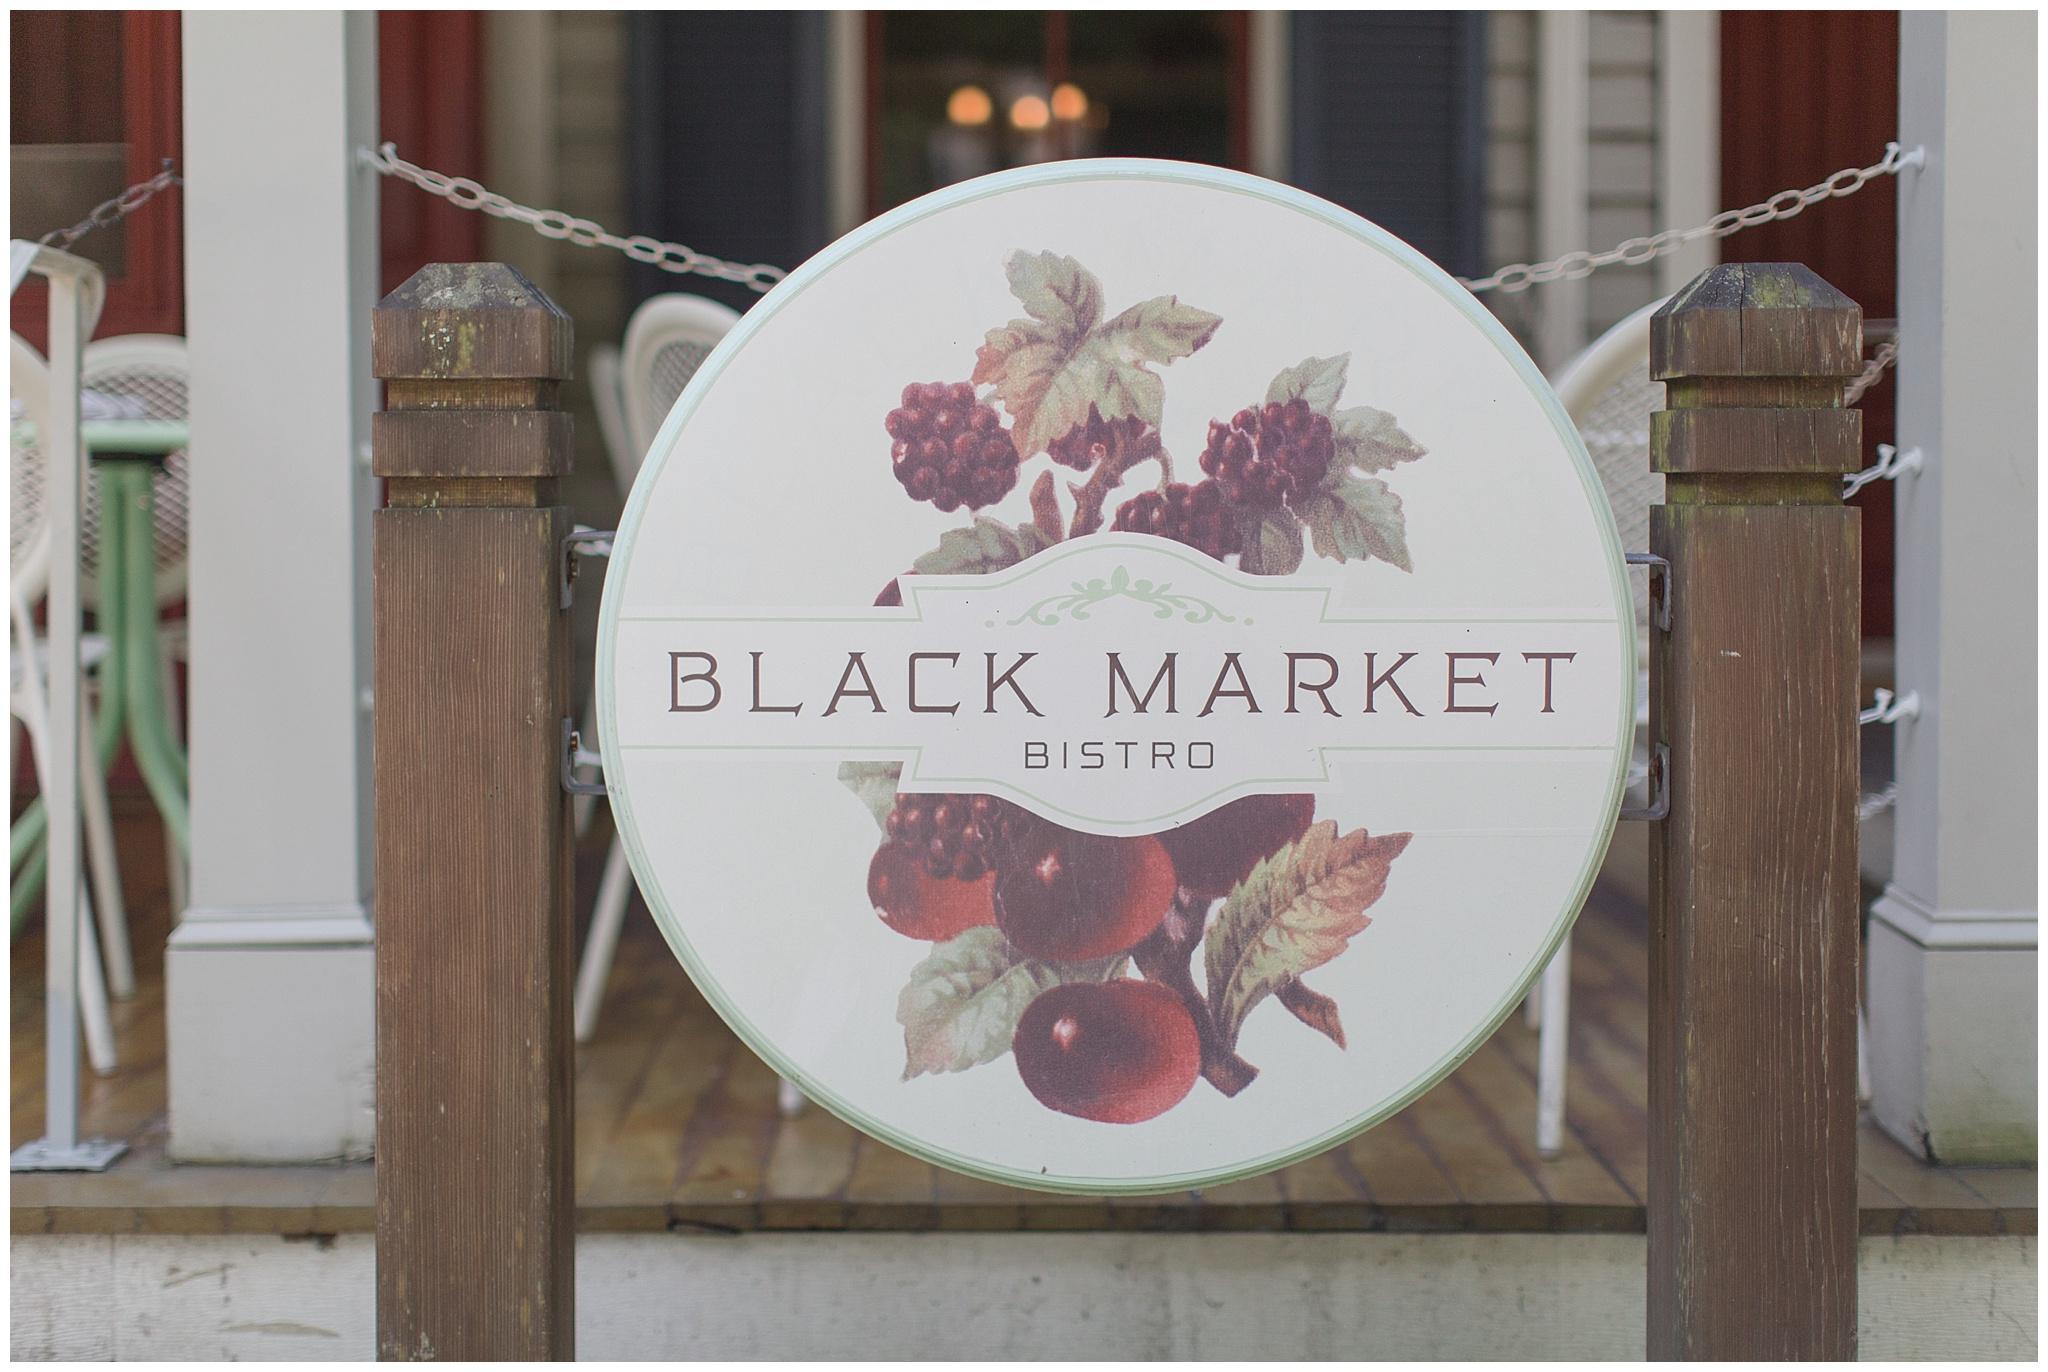 BlackMarketBistro_0006.jpg